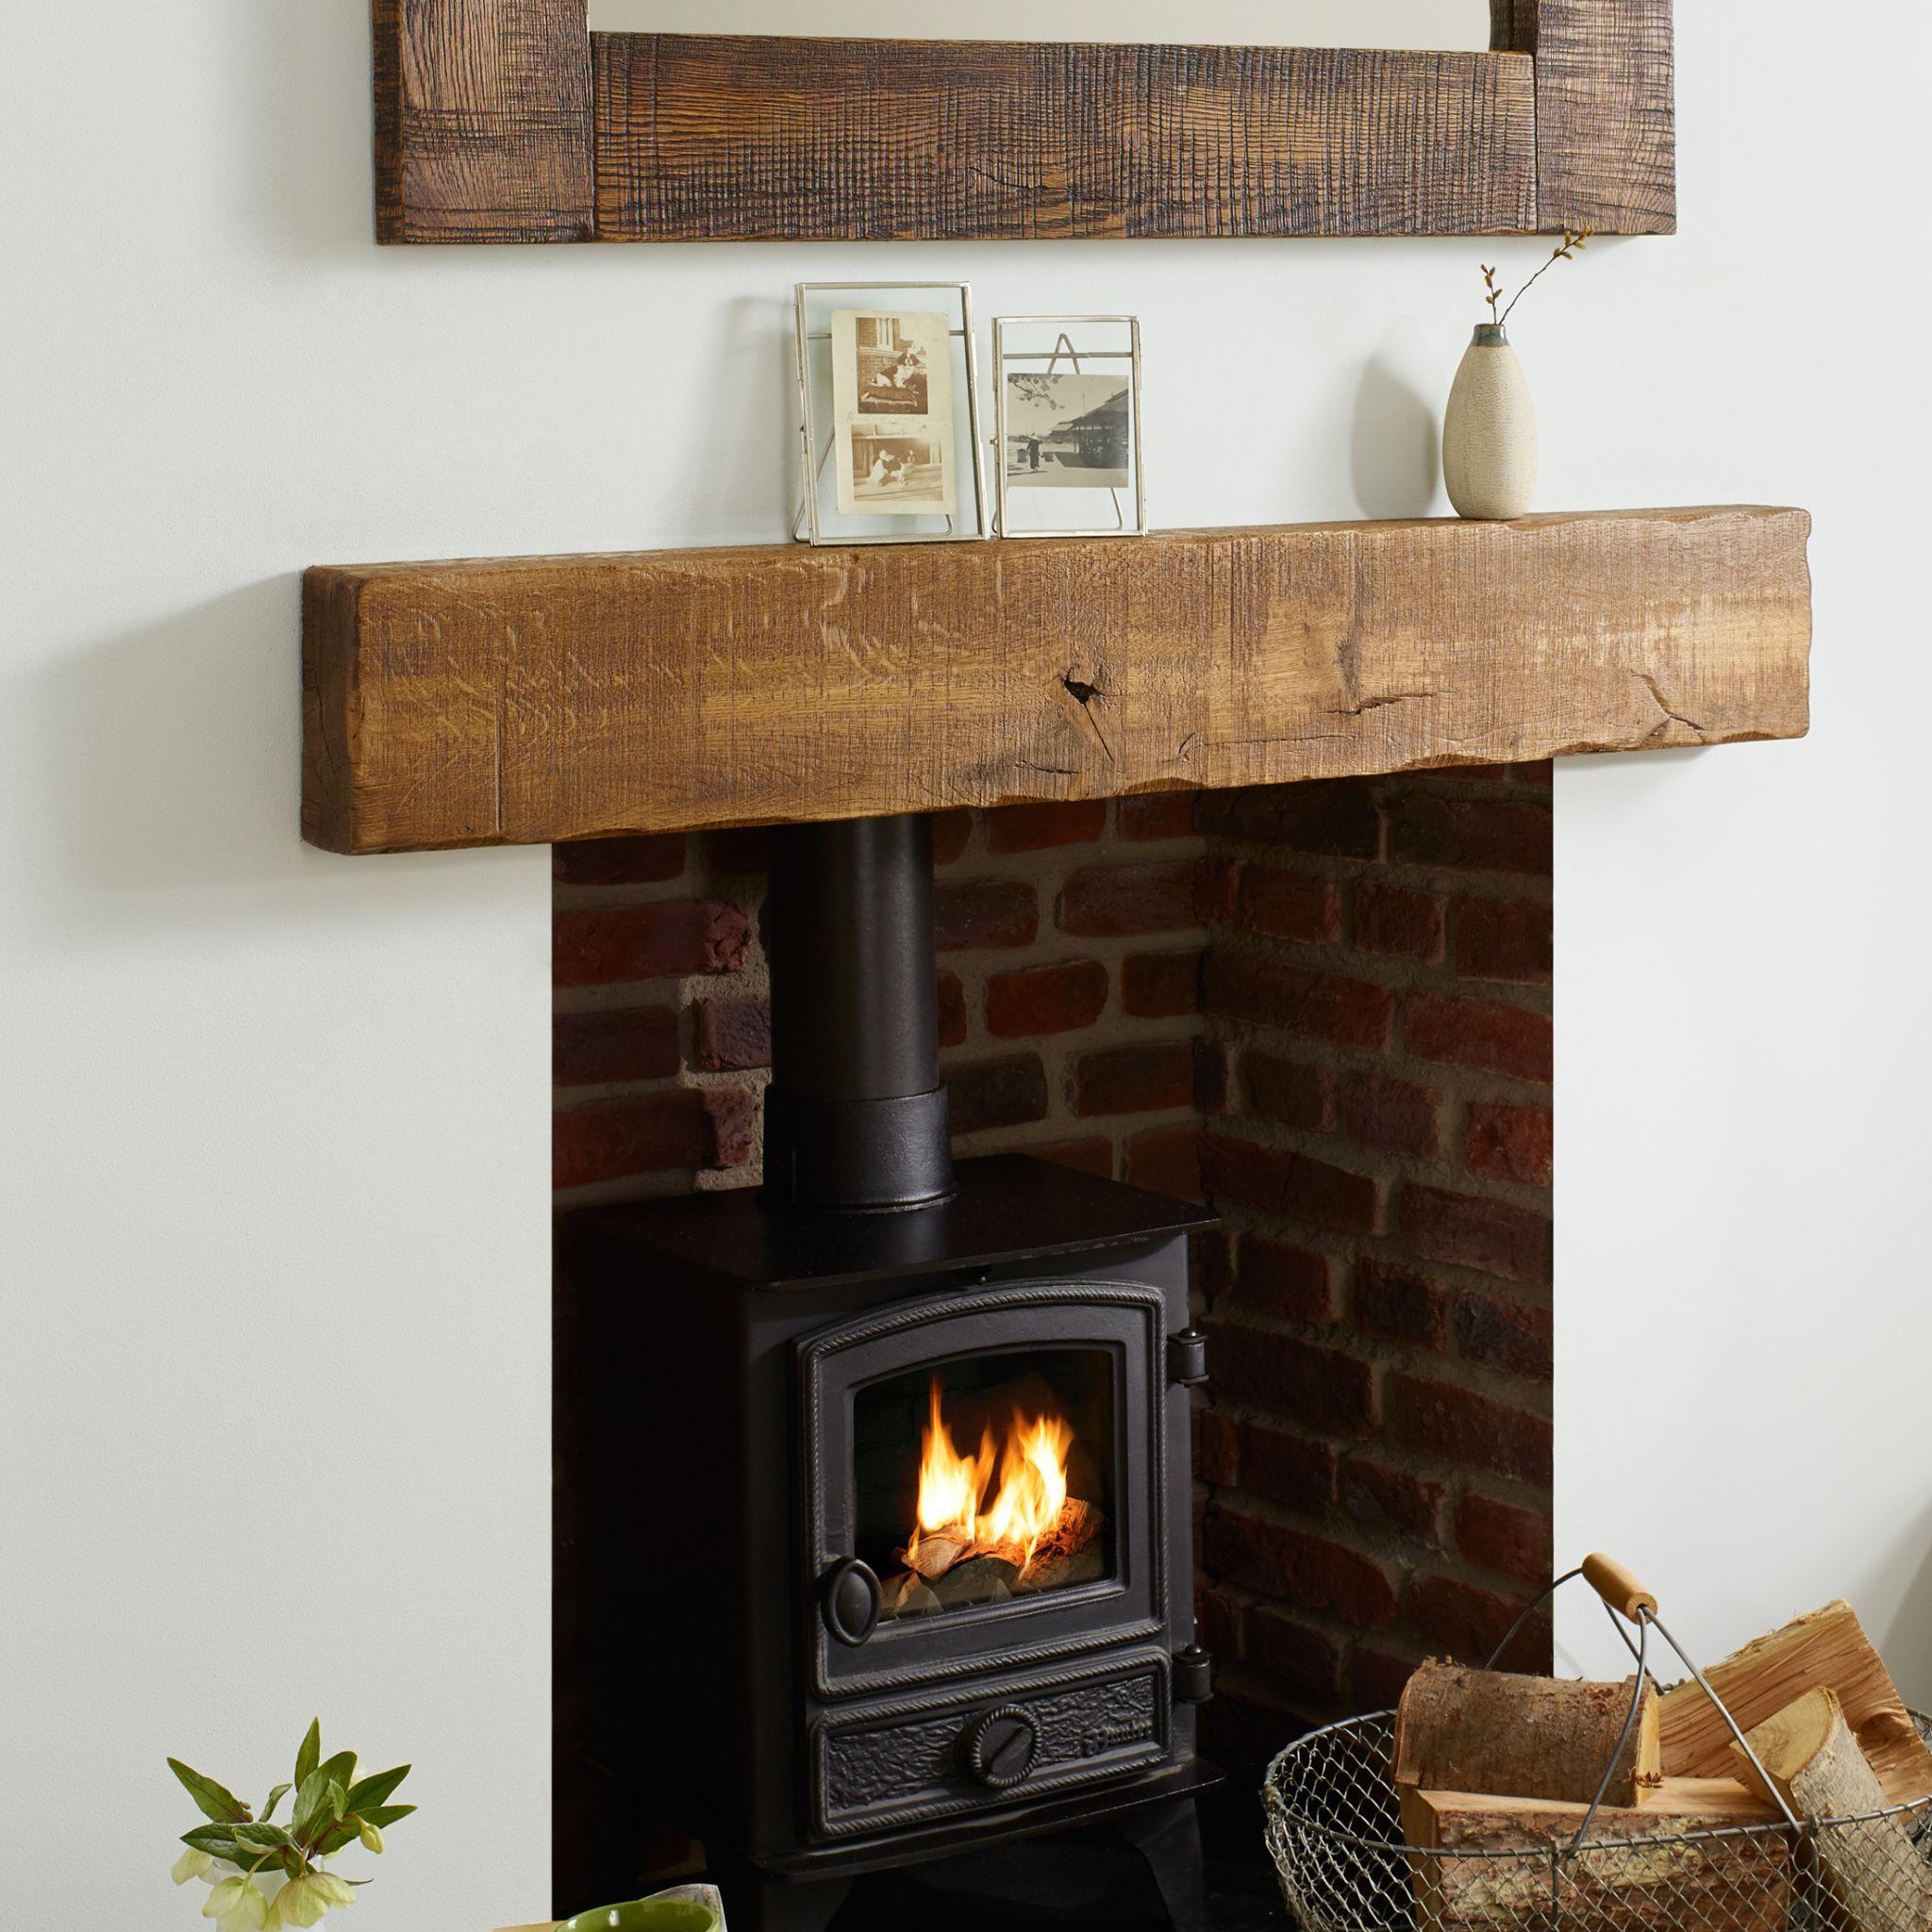 Solid Oak Beam Rustic Character Mantel Shelf Light Sawn